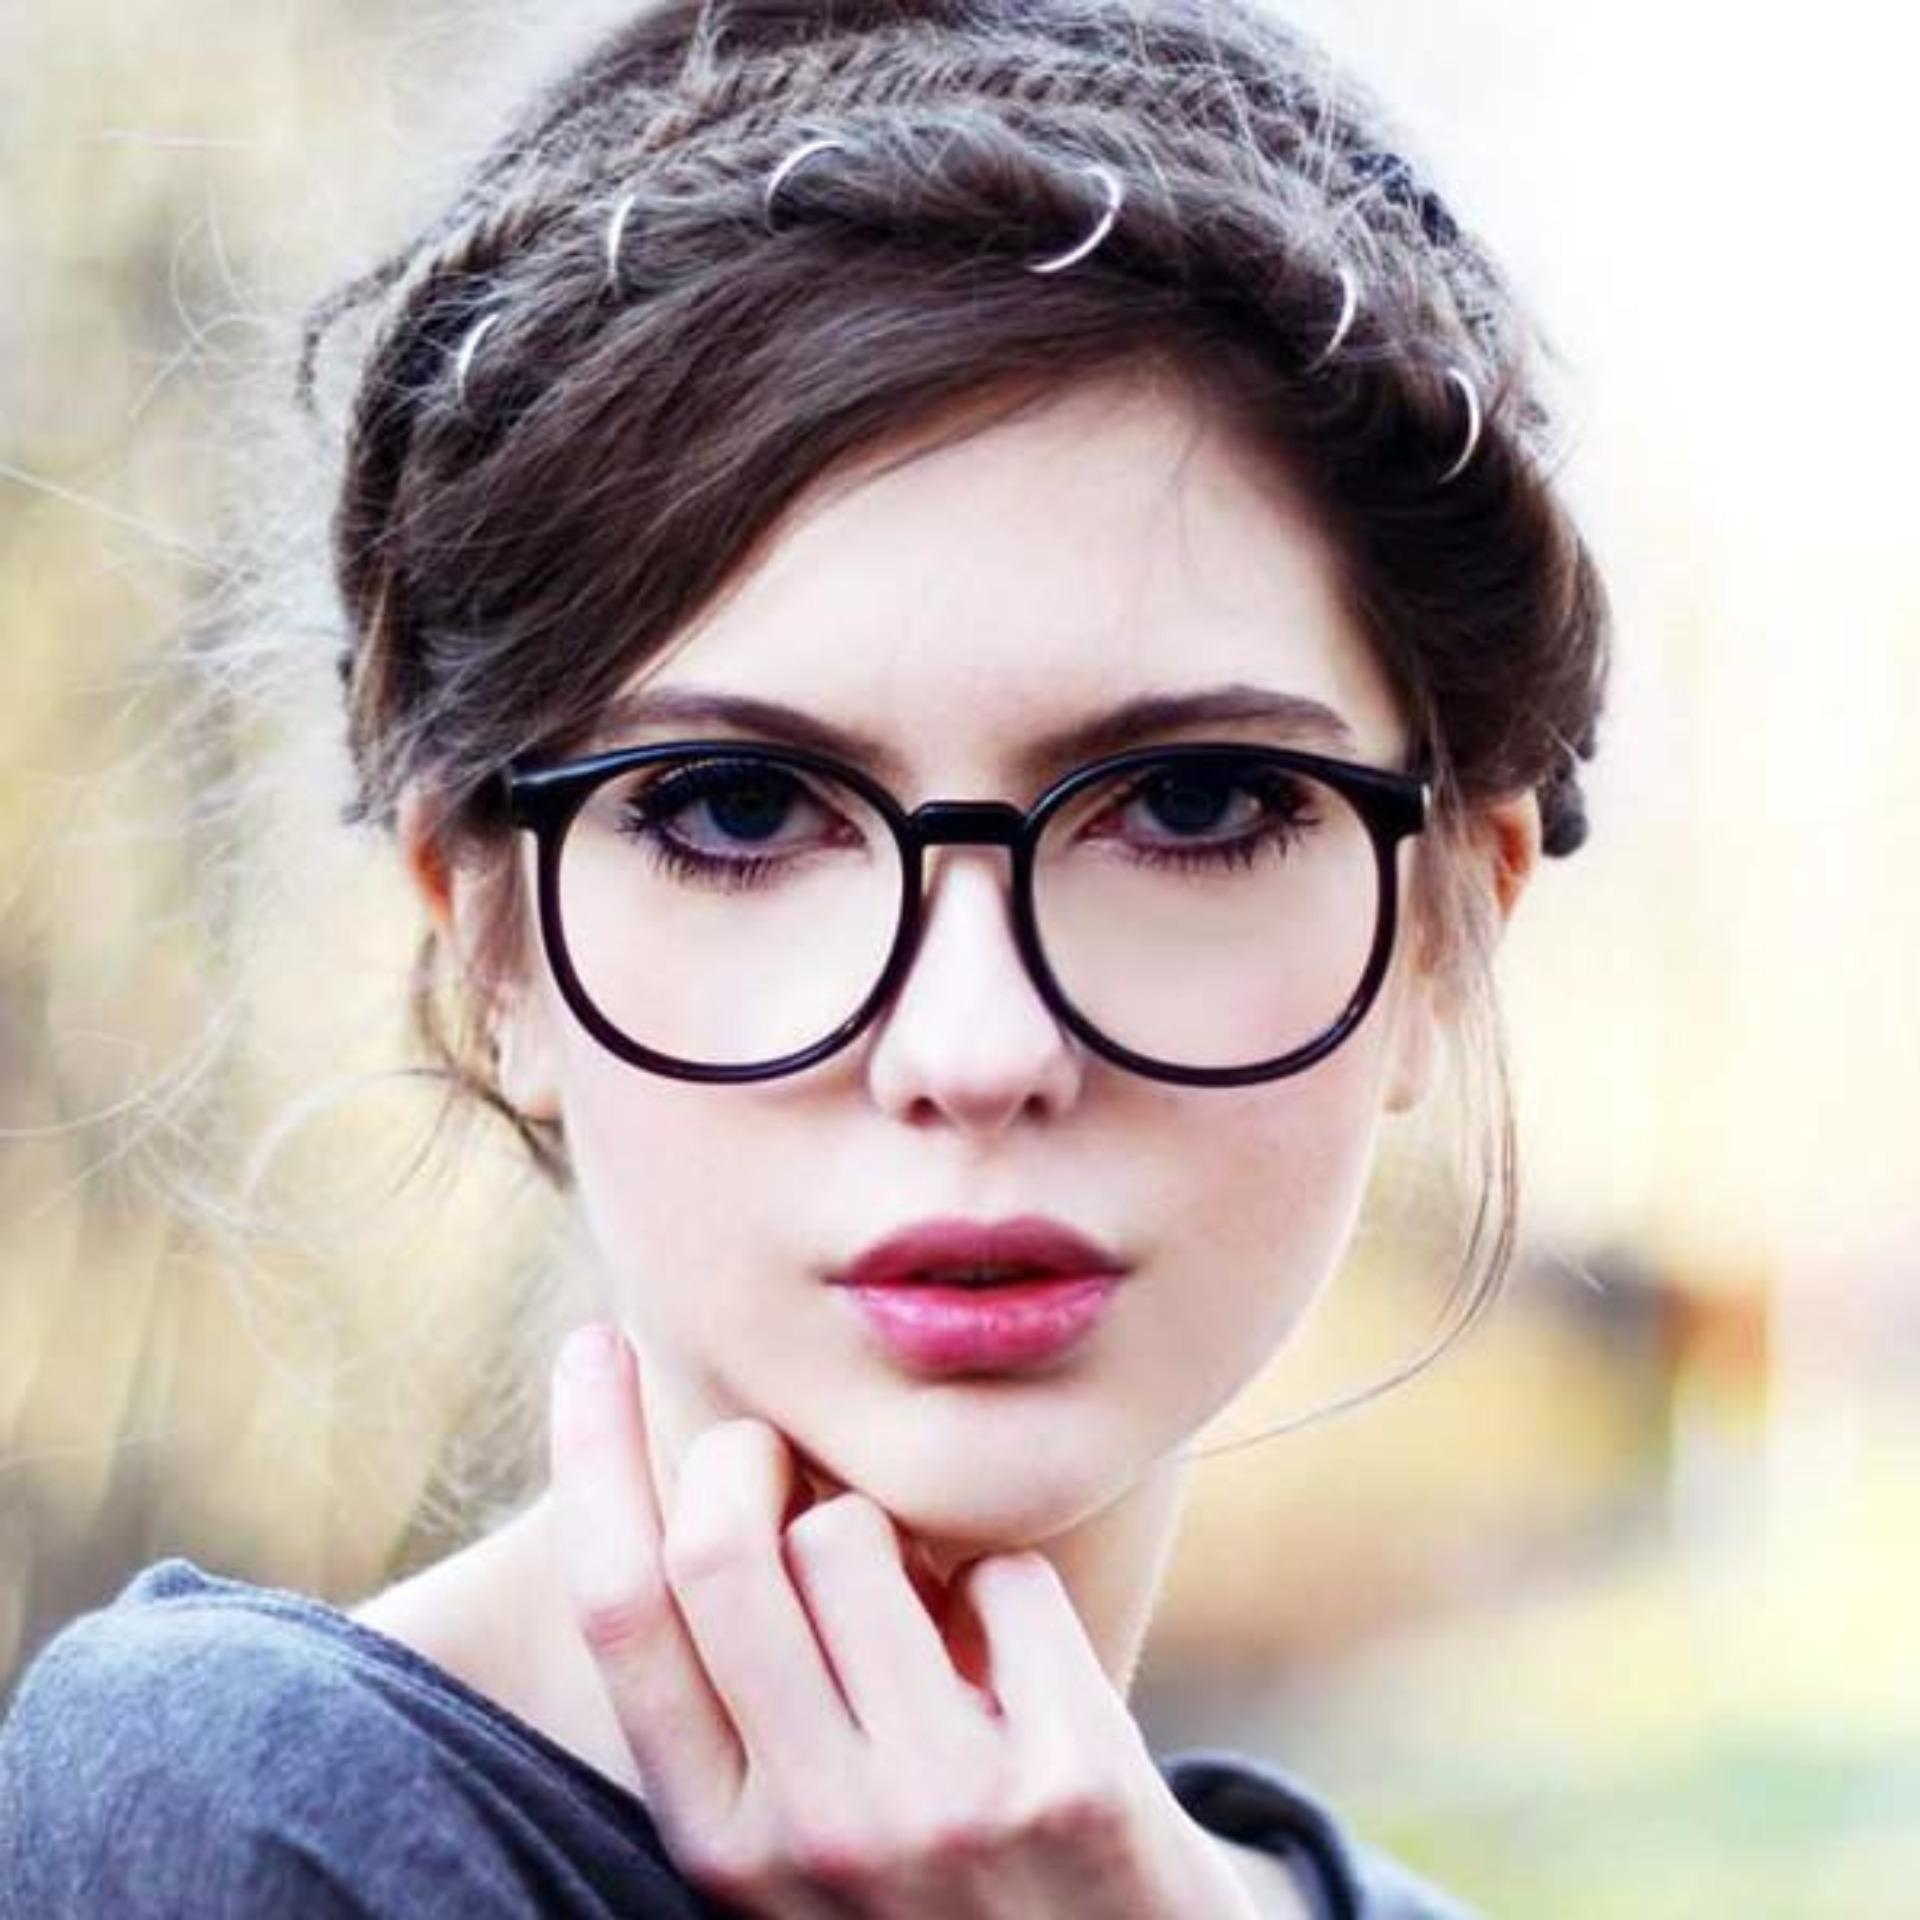 Indi Retro Round Clear Lens Fashion Glasses 14977 L - Kacamata Wanita